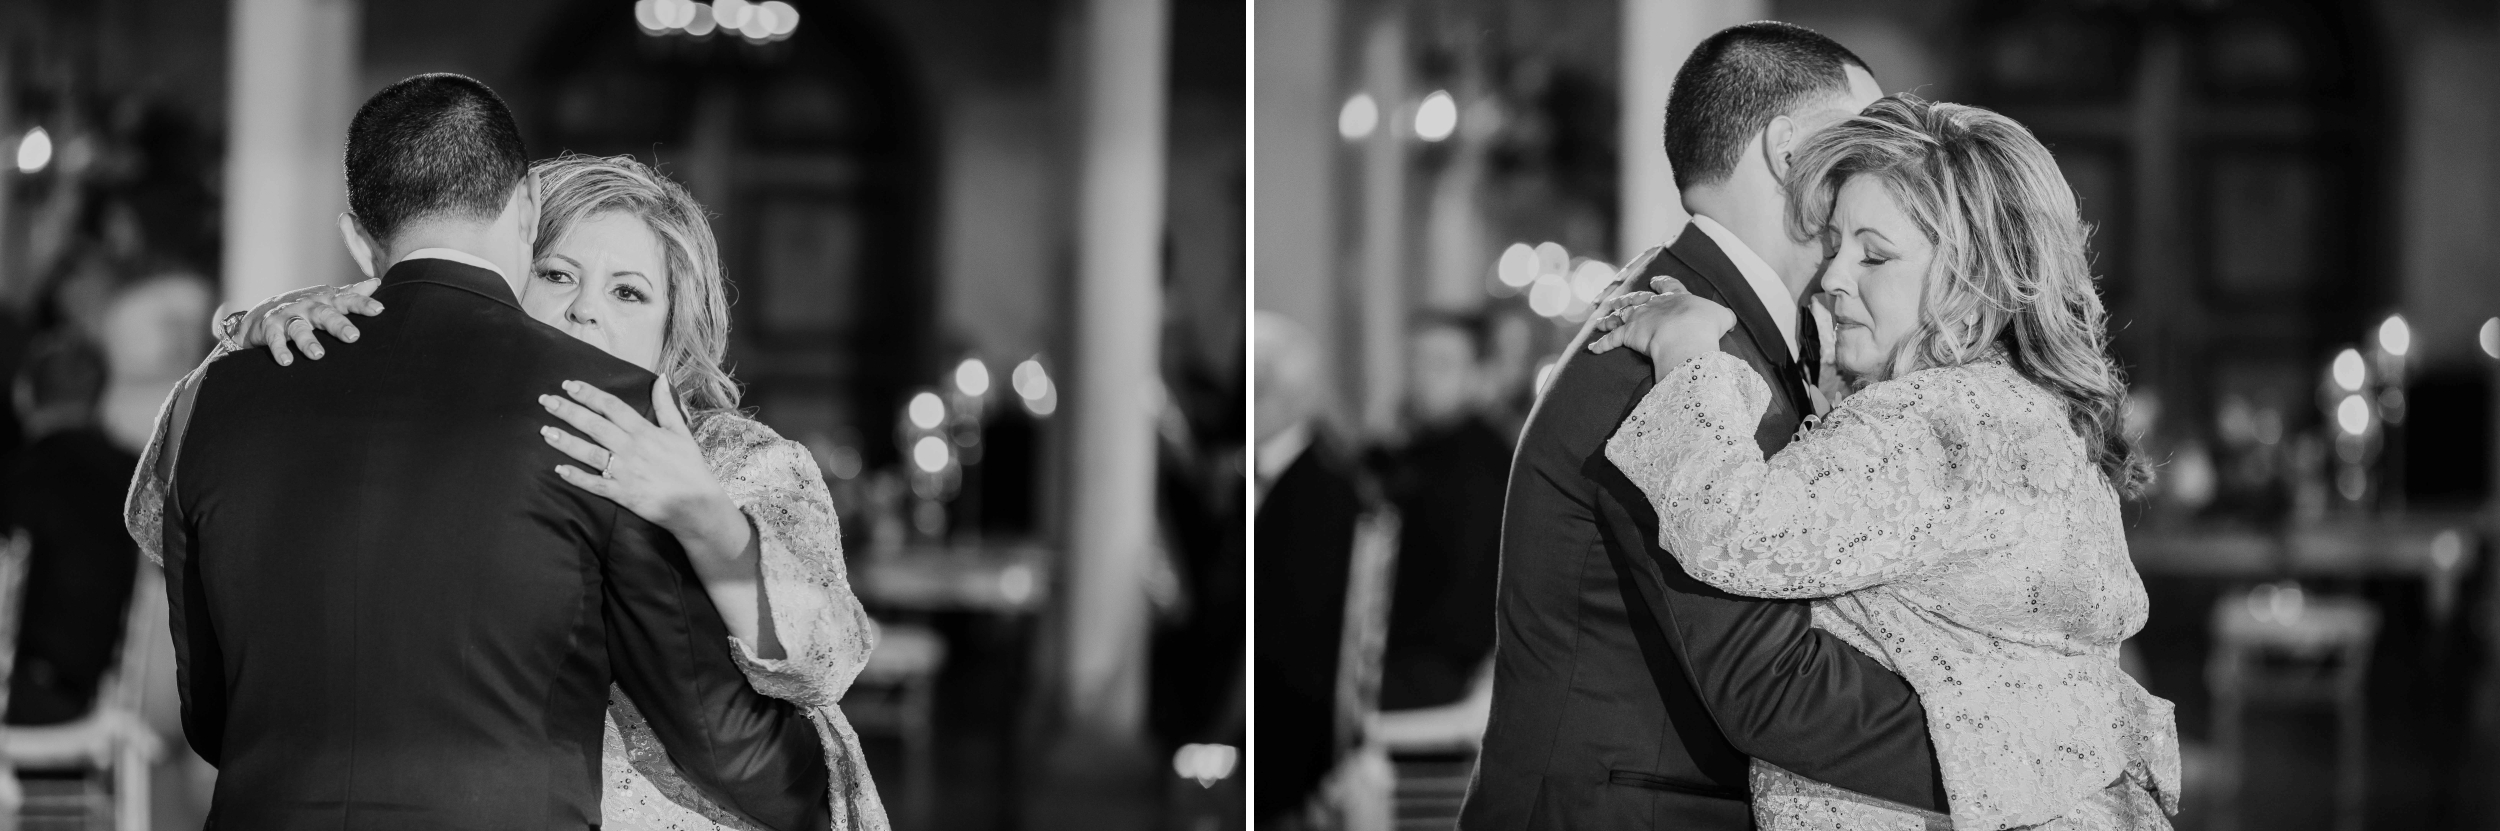 Wedding - Coco Plum - Coral Gables Congregational - Santy Martinez Photography 36.jpg